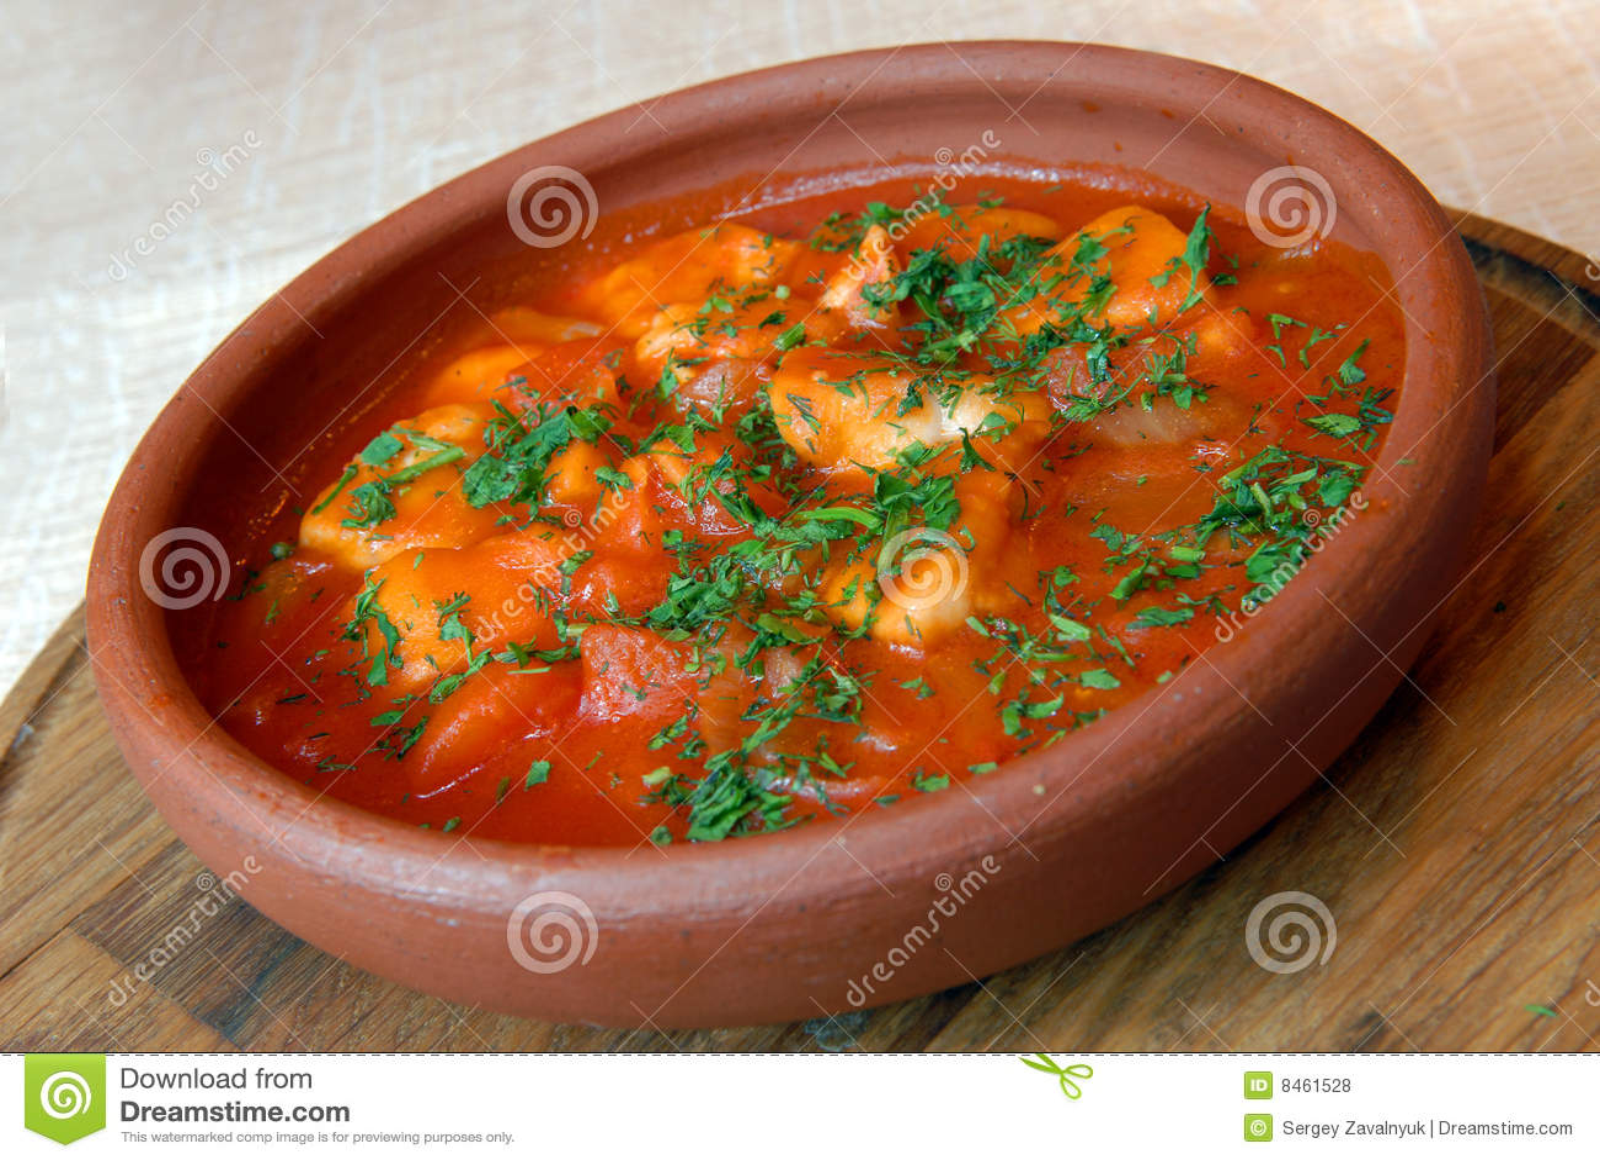 Bakad meatpotatis